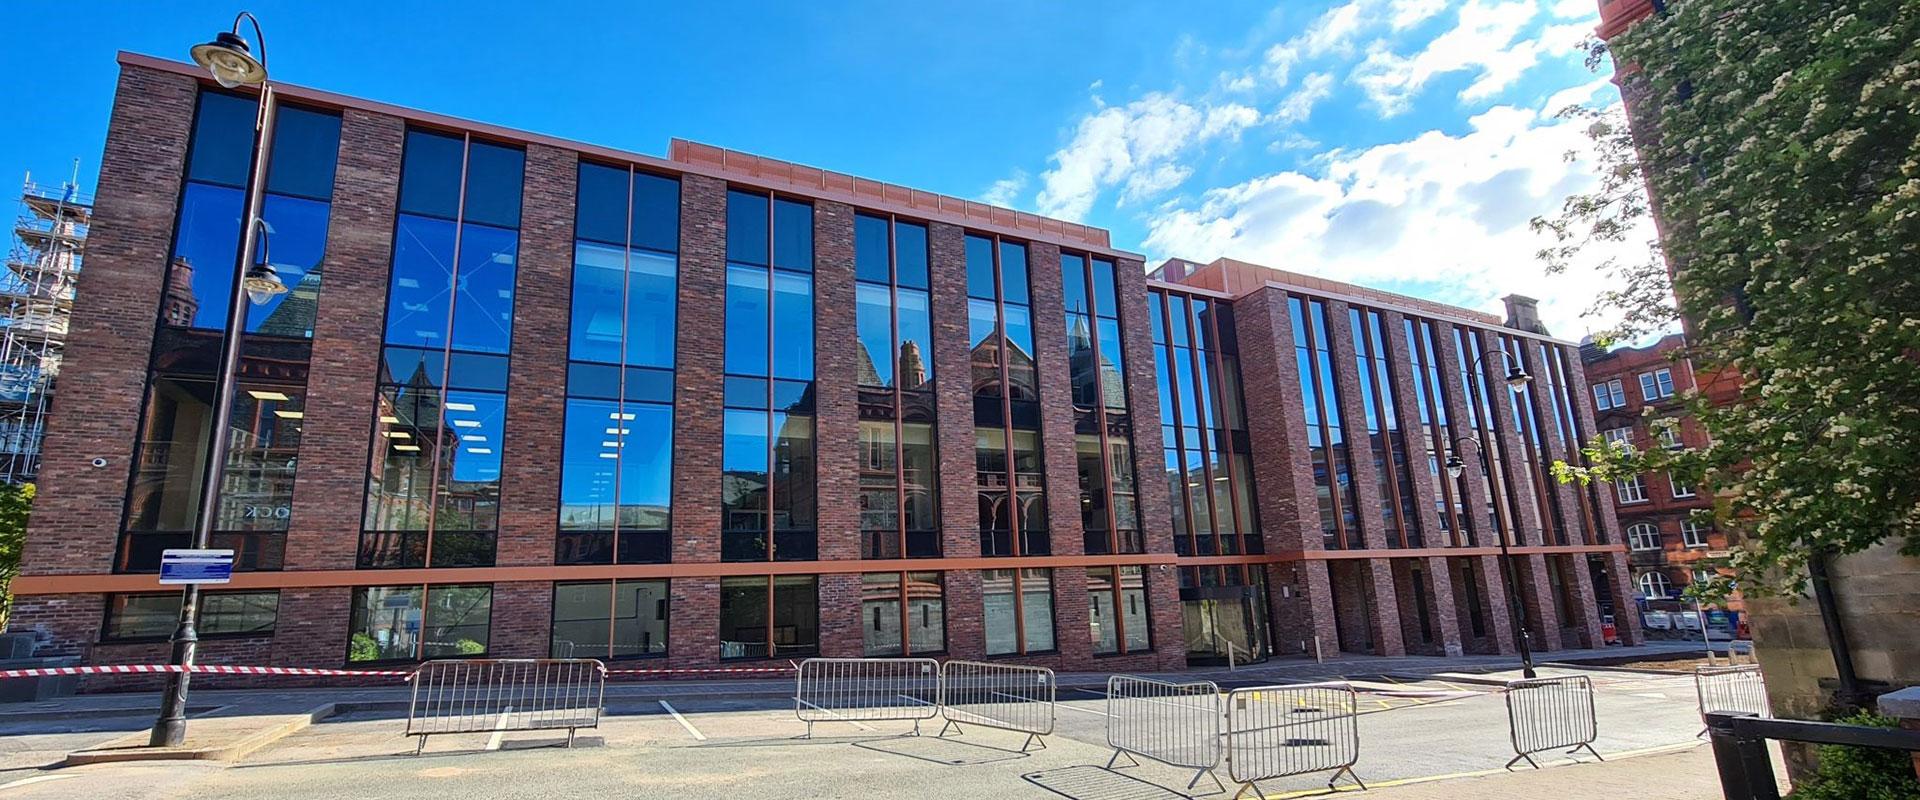 John Turner Construction complete Liverpool's new Digital Innovation Facility